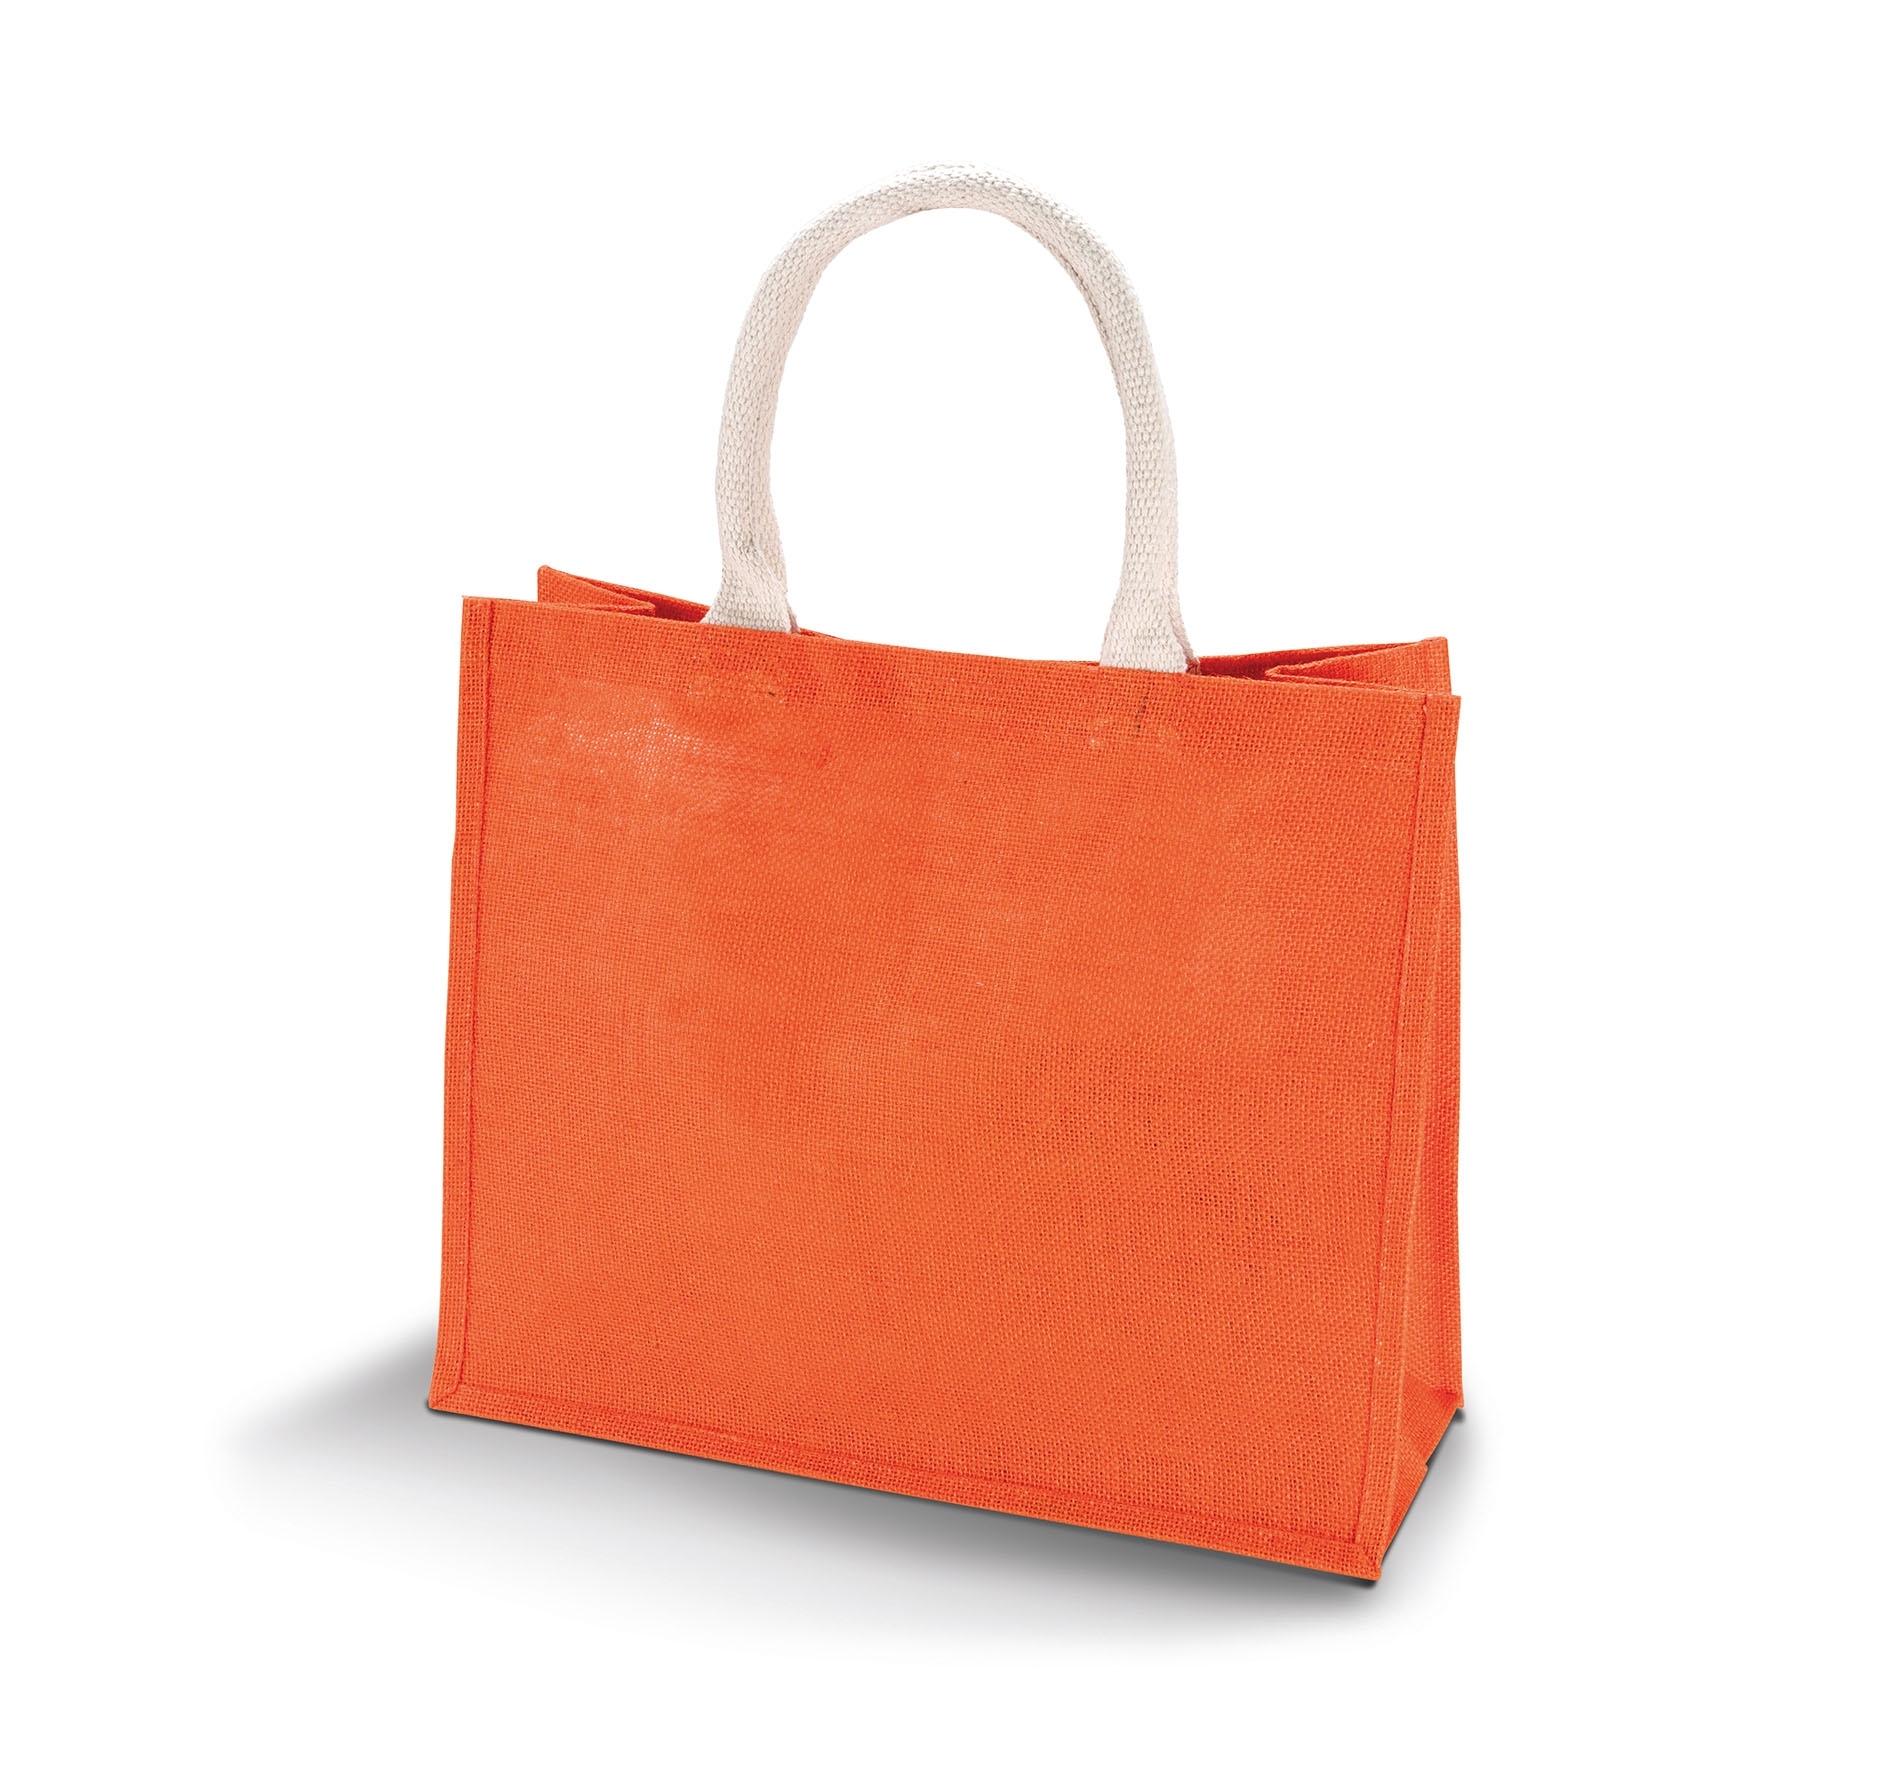 sac de plage en jute kimood saffron gladiasport. Black Bedroom Furniture Sets. Home Design Ideas